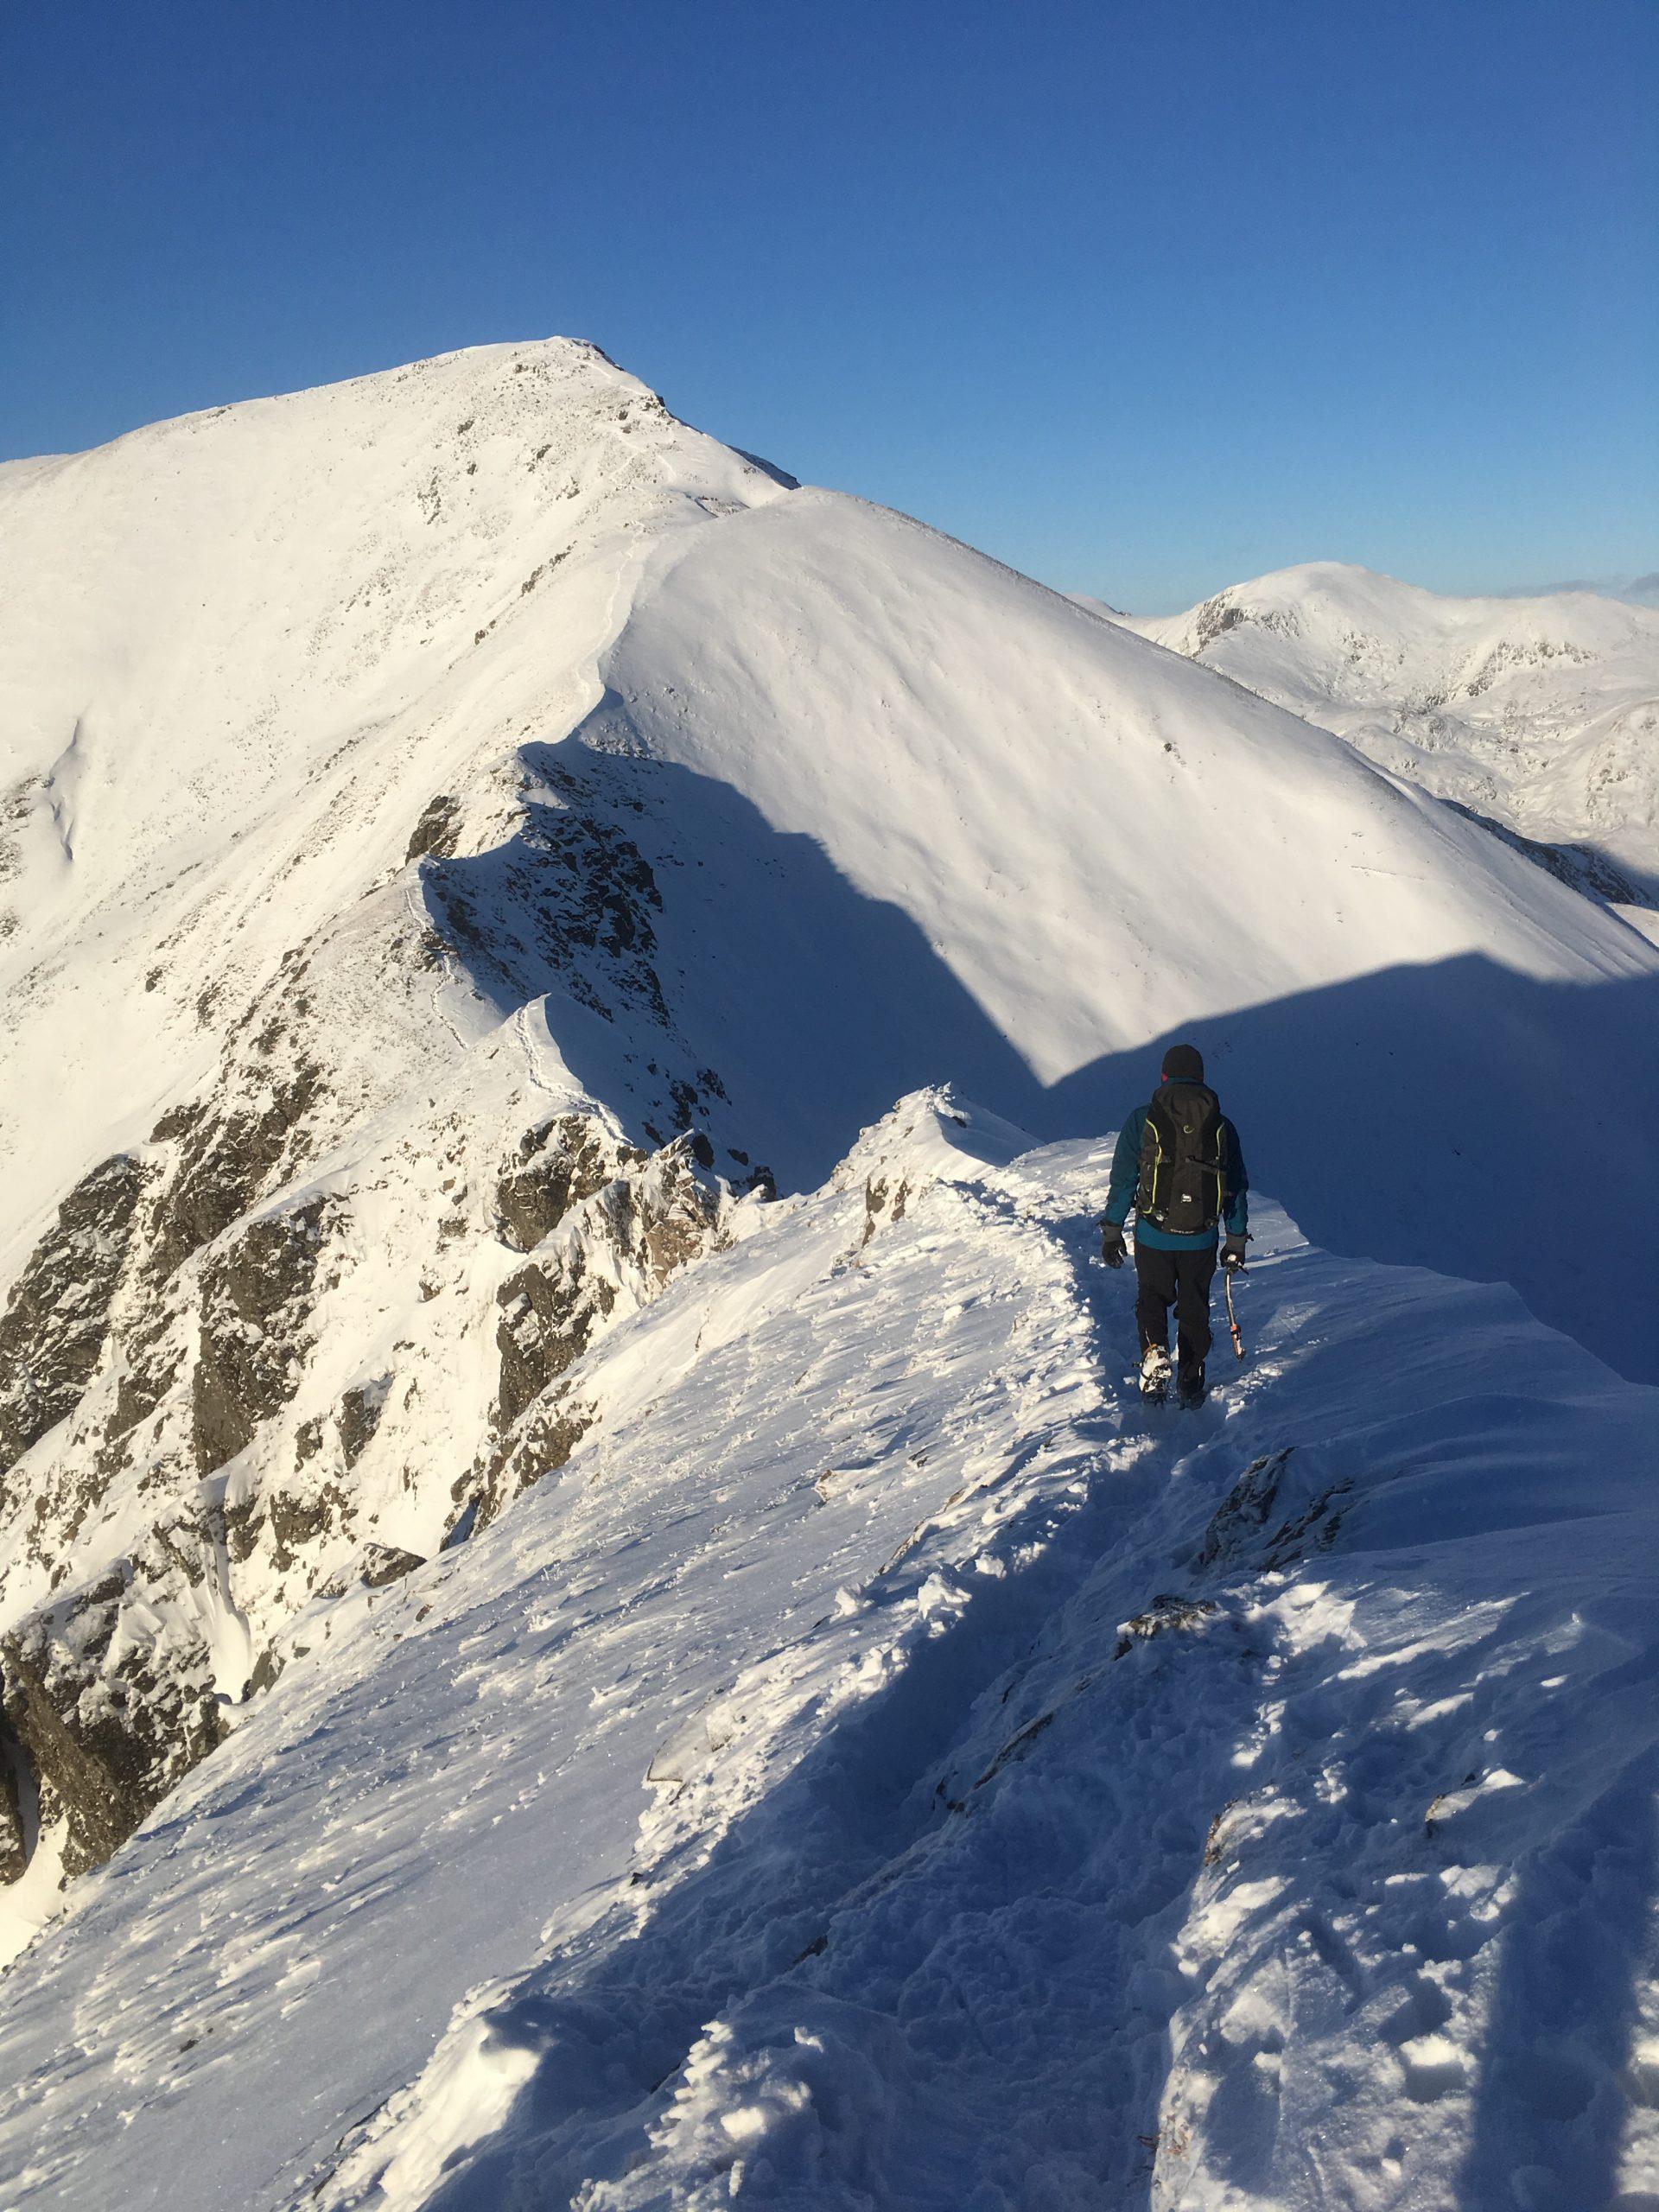 Winter skills course in Scotland in the Cairngorms, Glencoe or Ben Nevis